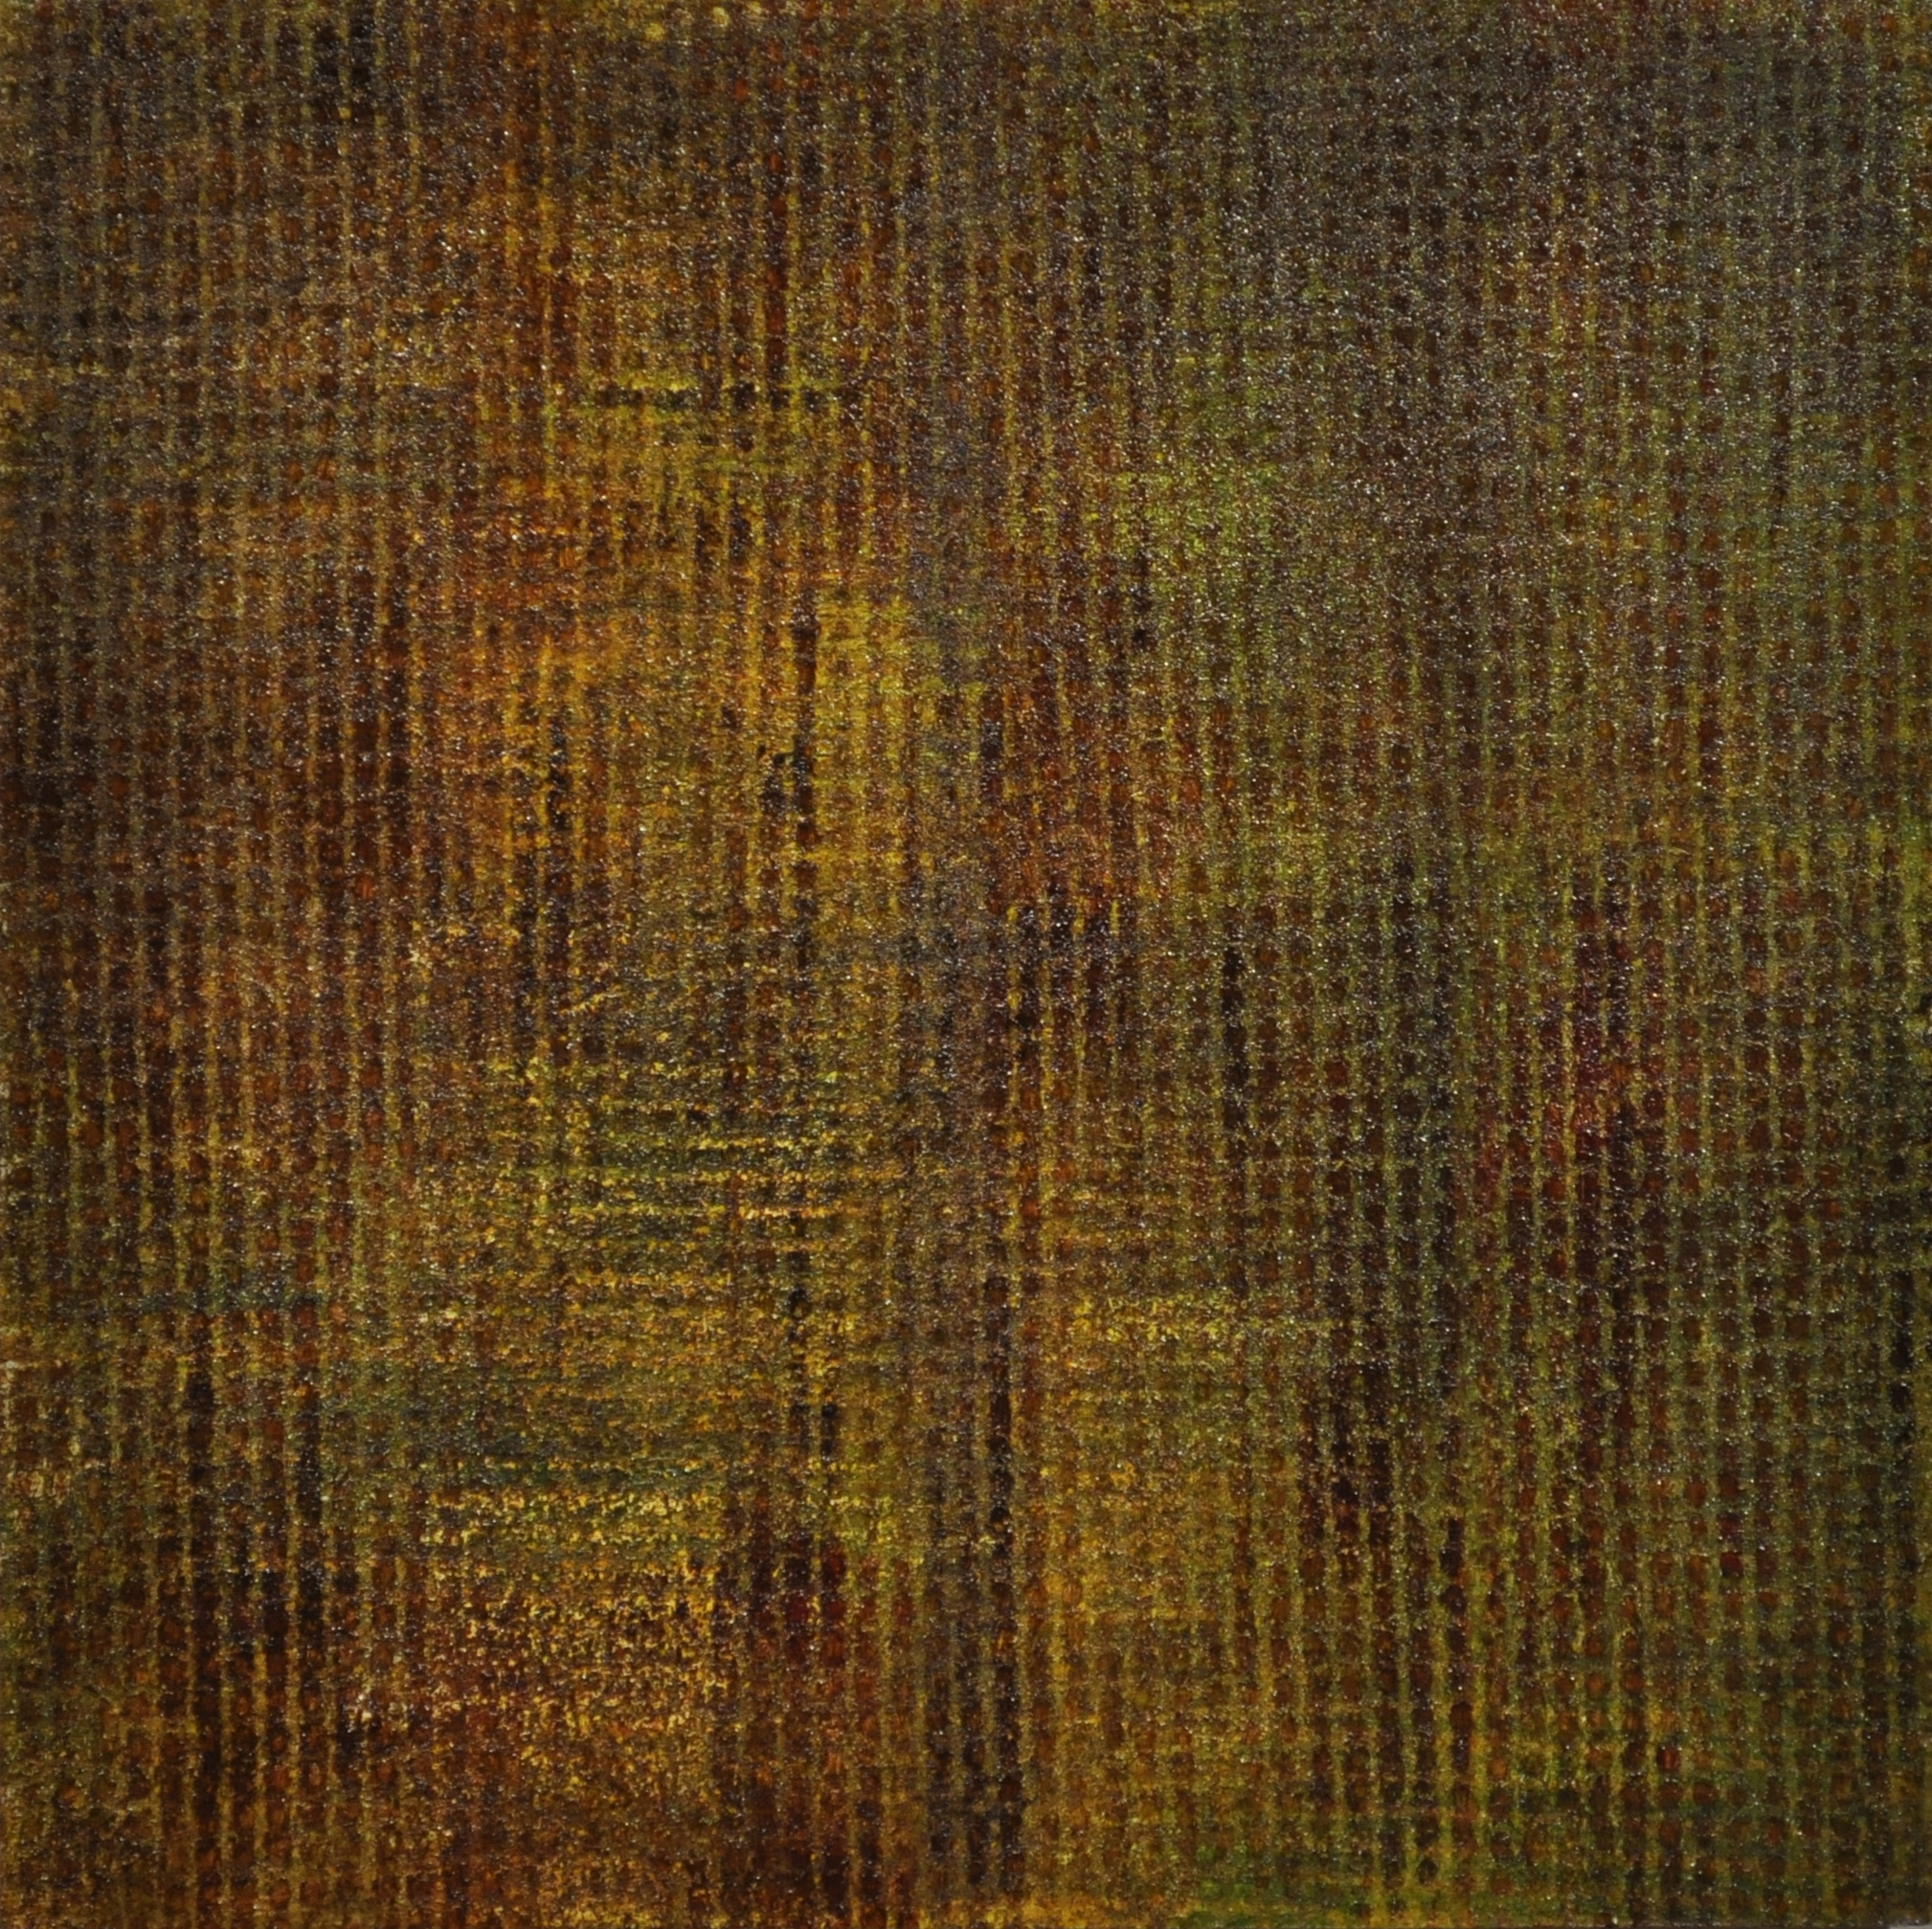 discern, 2017  oil on wood panel, 20 x 20 cm